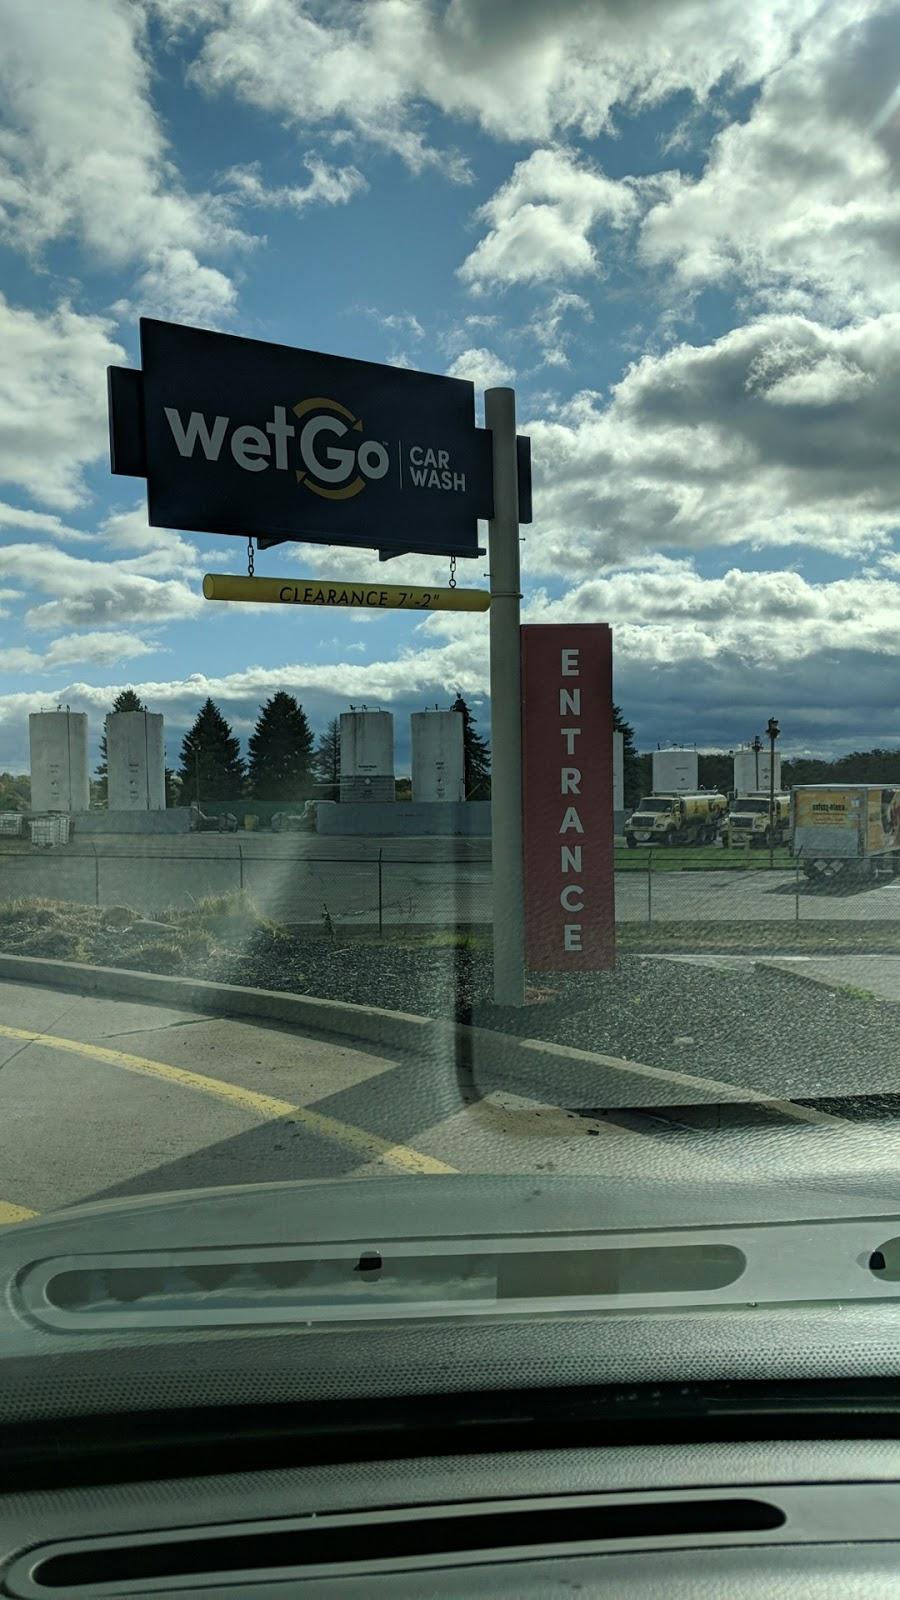 GetGo Gas Station & WetGo Car Wash - gas station    Photo 3 of 10   Address: 1001 Lebanon Rd, West Mifflin, PA 15122, USA   Phone: (412) 461-2114